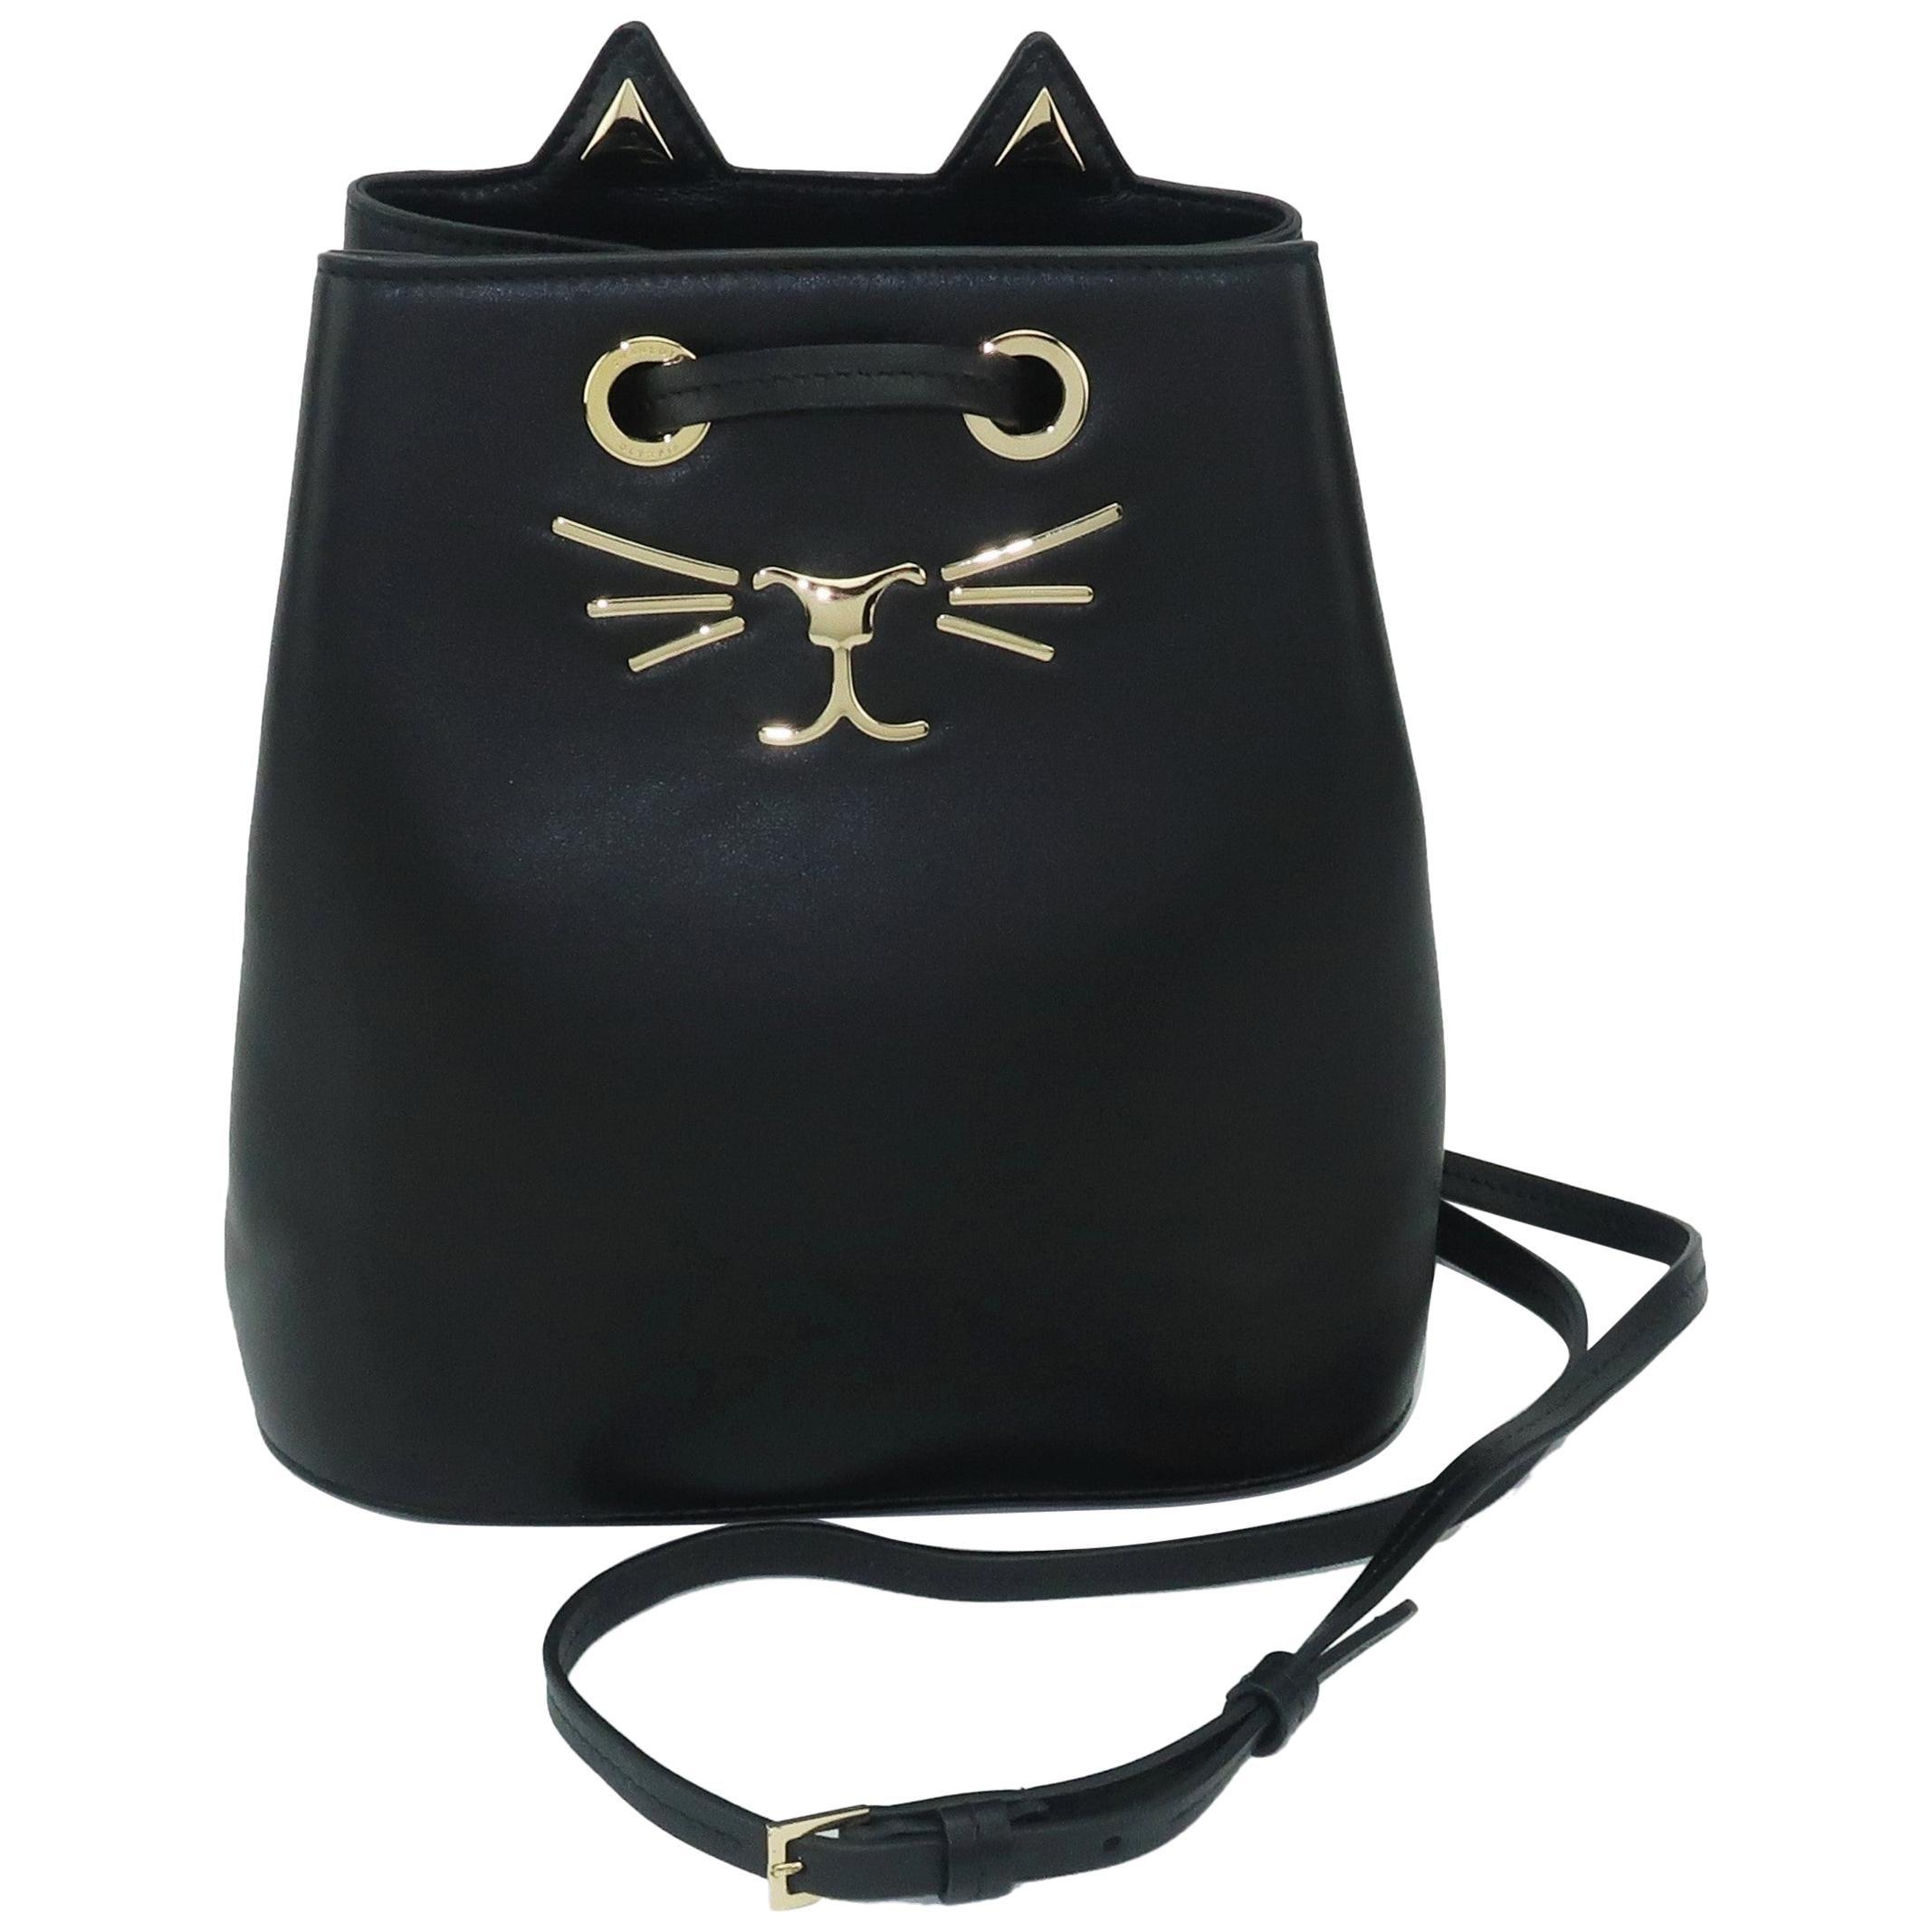 e43c2d33b Vintage and Designer Bags - 24,060 For Sale at 1stdibs